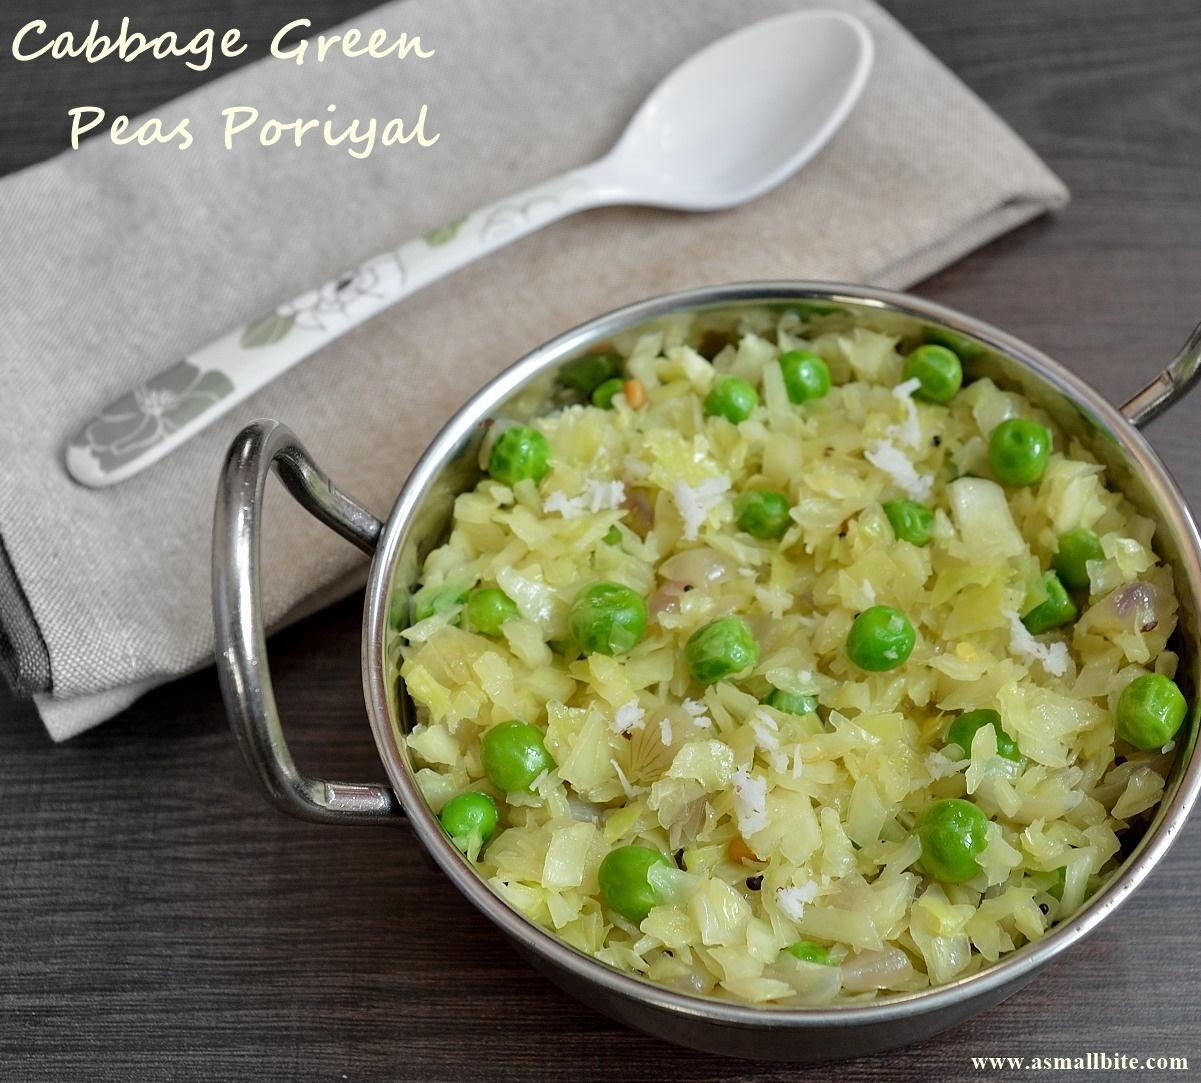 Cabbage Green Peas Poriyal | Cabbage Peas Stir Fry